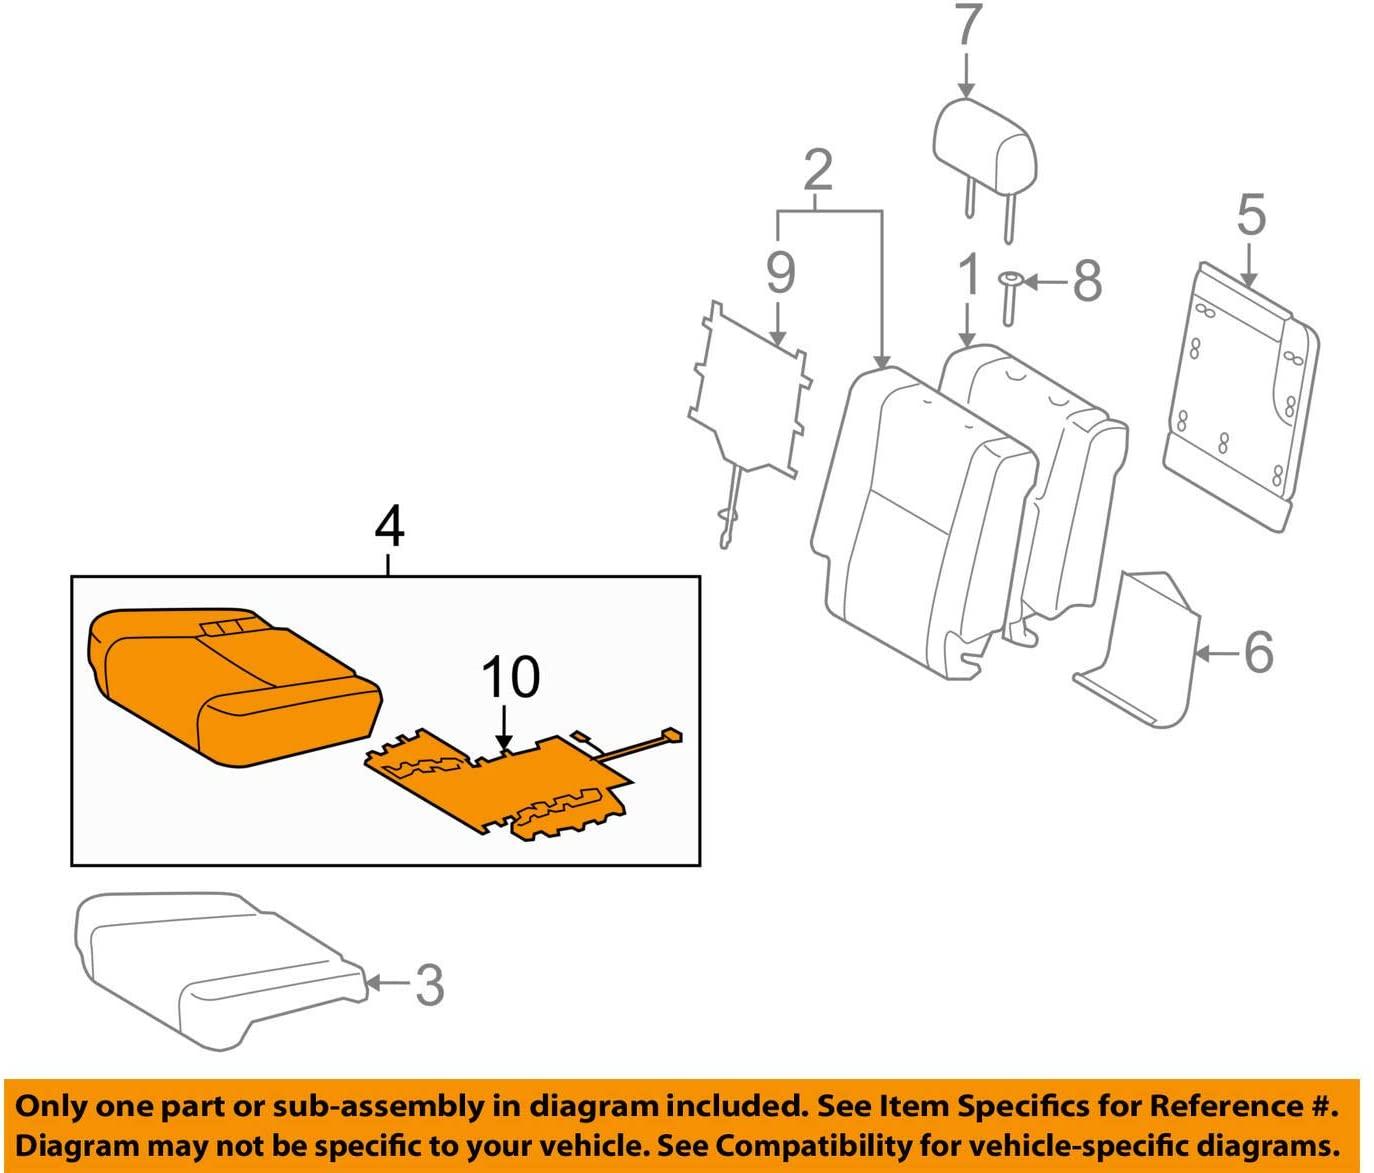 TOYOTA Genuine 71076-0C350-E0 Seat Cushion Cover